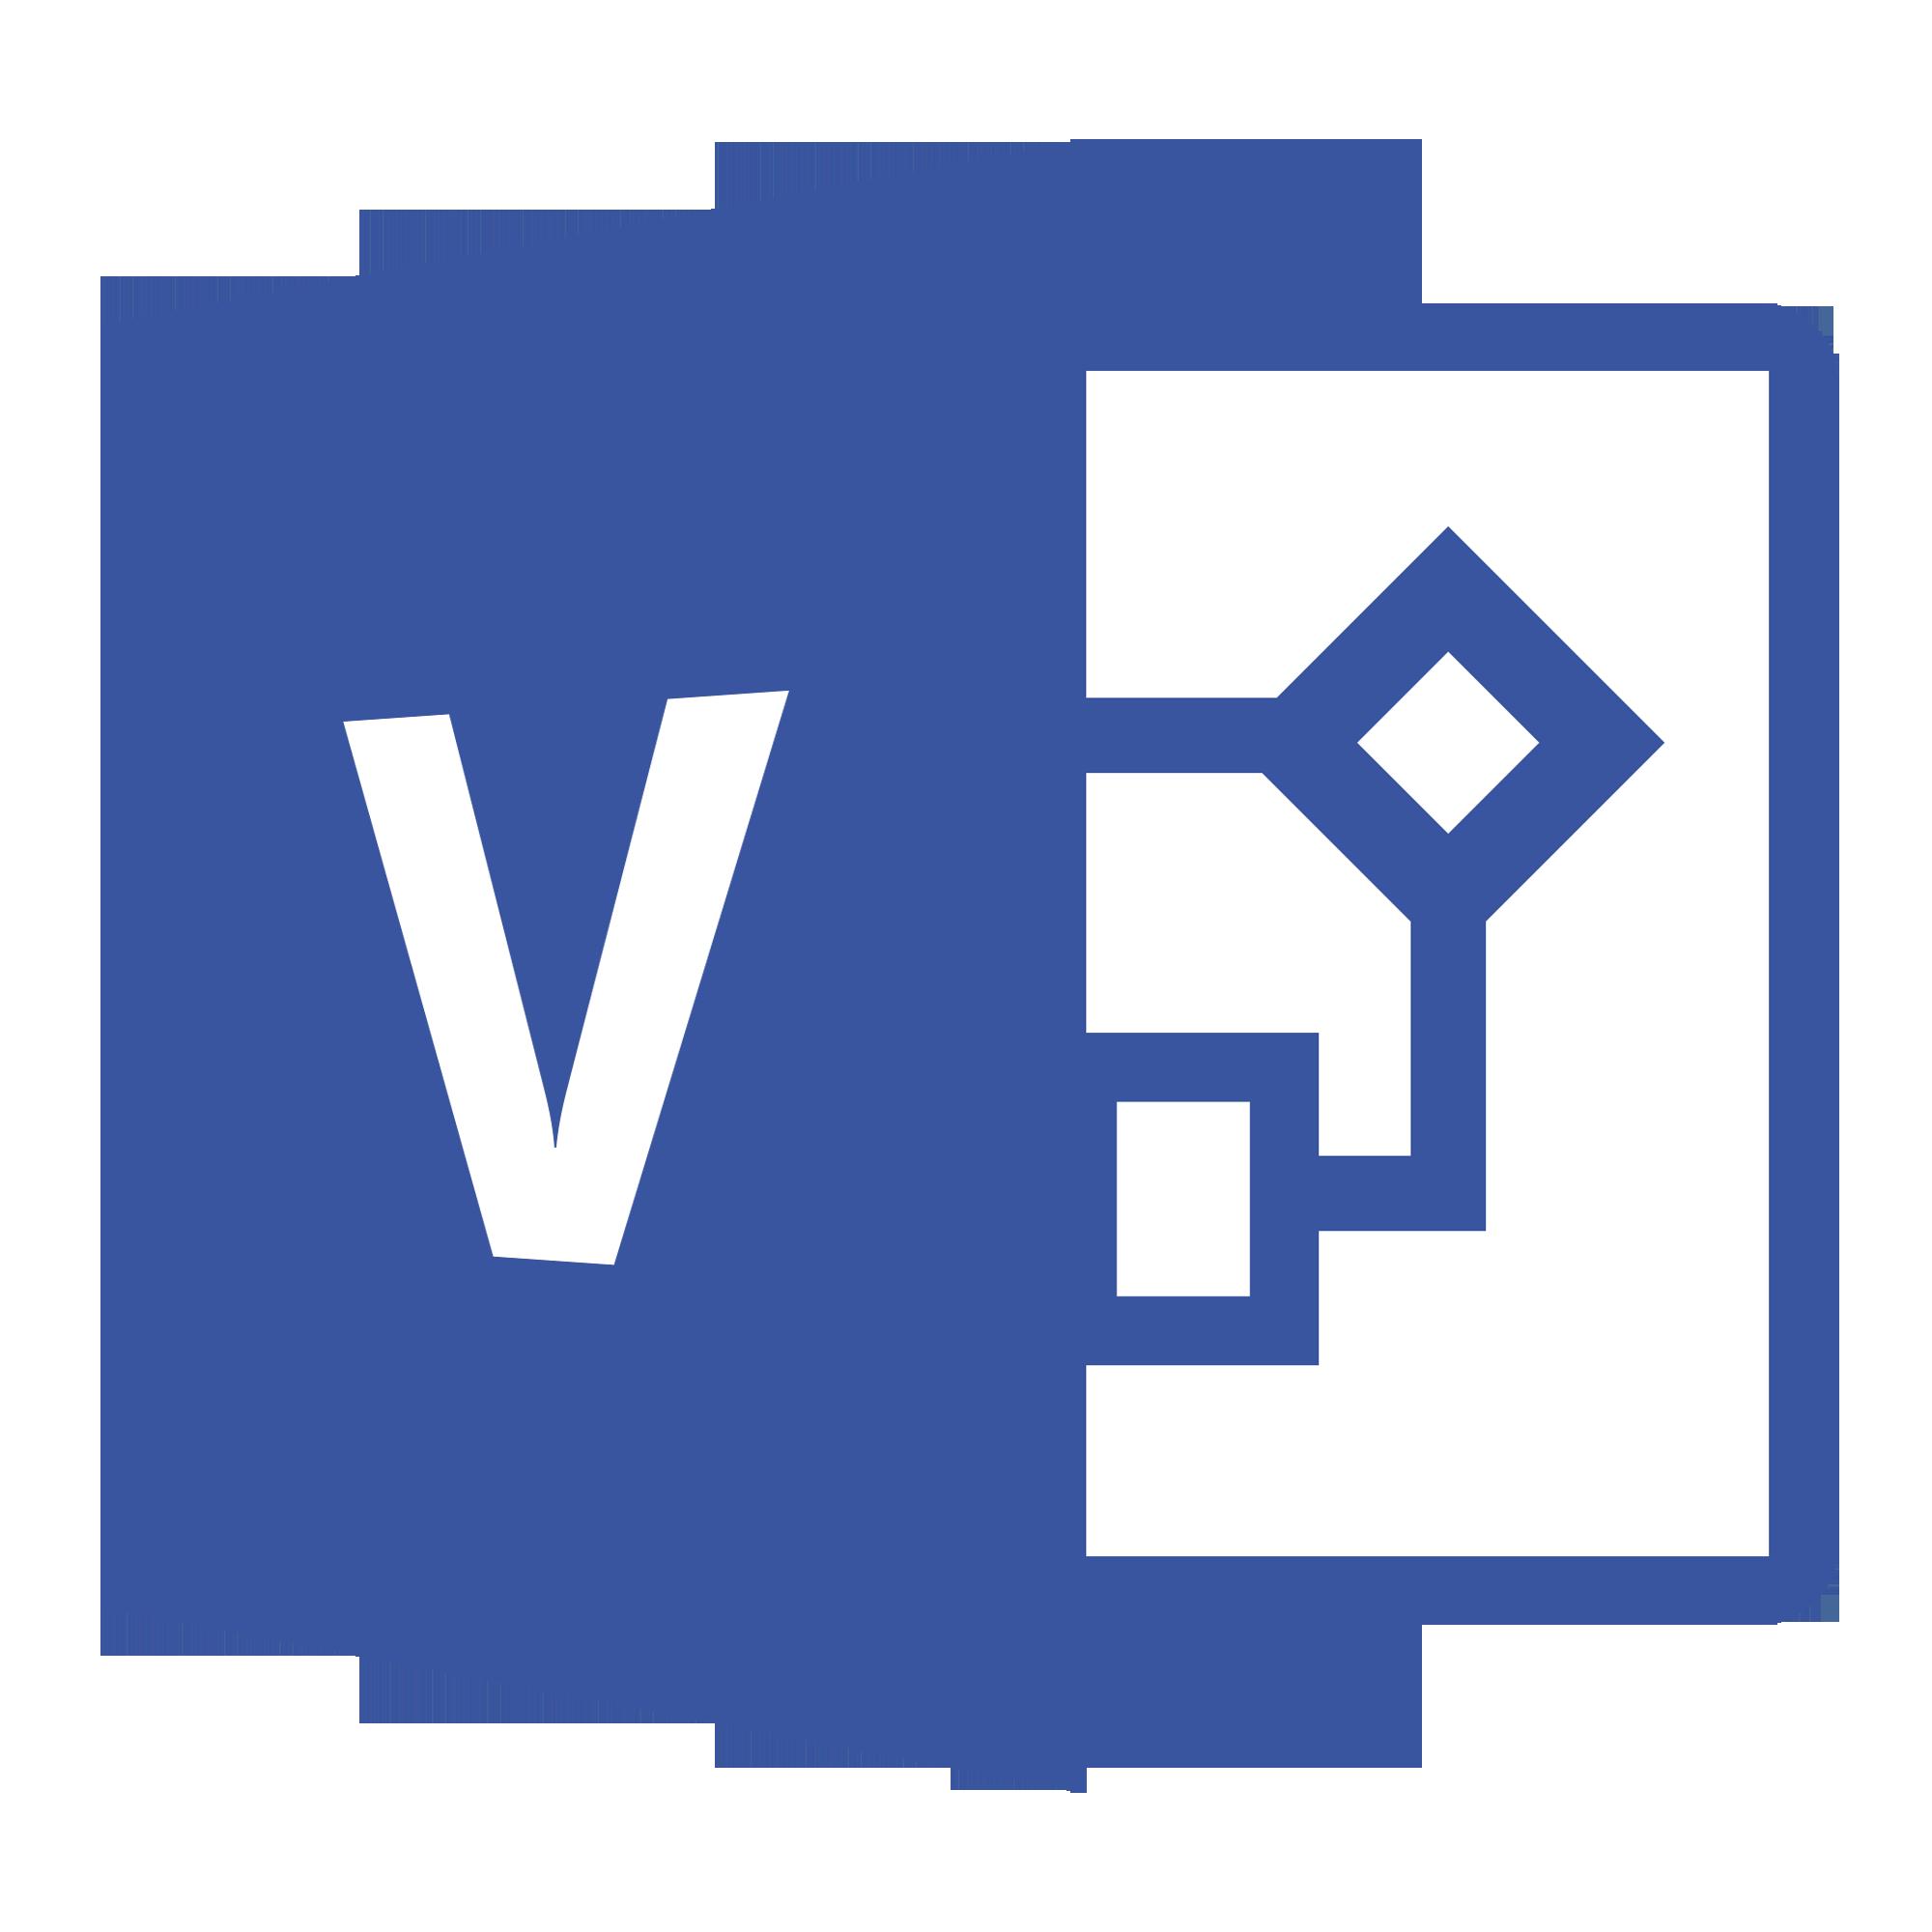 File:Microsoft Visio Logo.png.